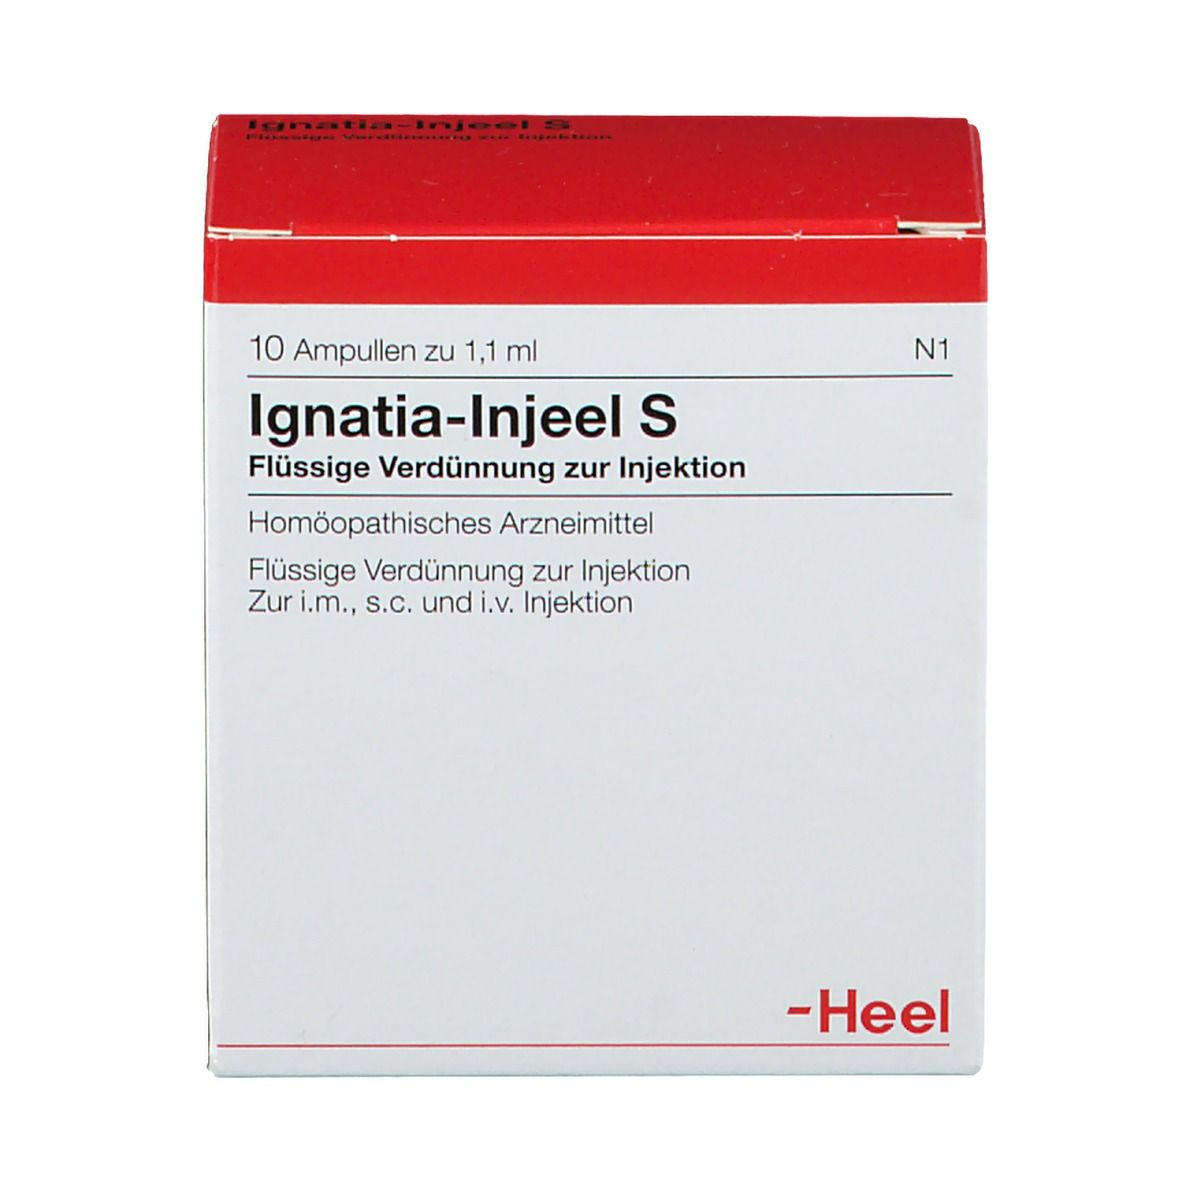 Ignatia-Injeel® S Ampullen